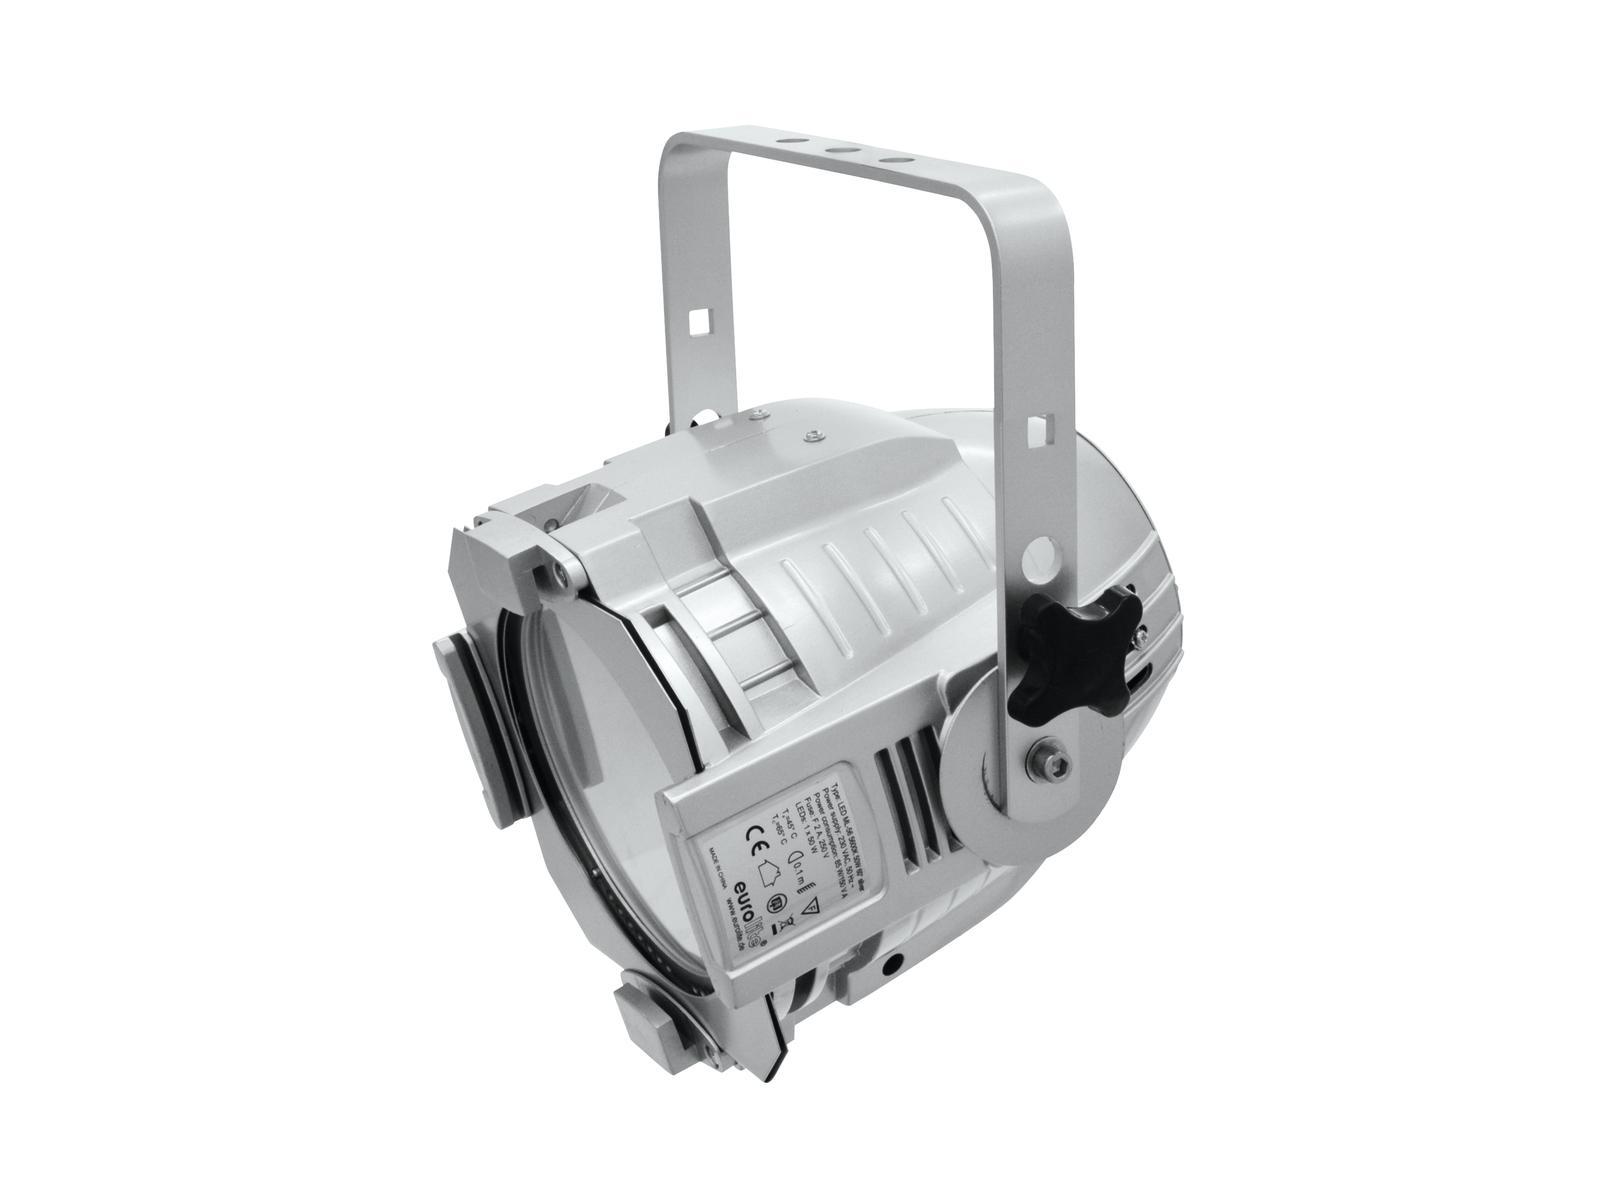 EUROLITE LED ML-56 COB CW/WW 1